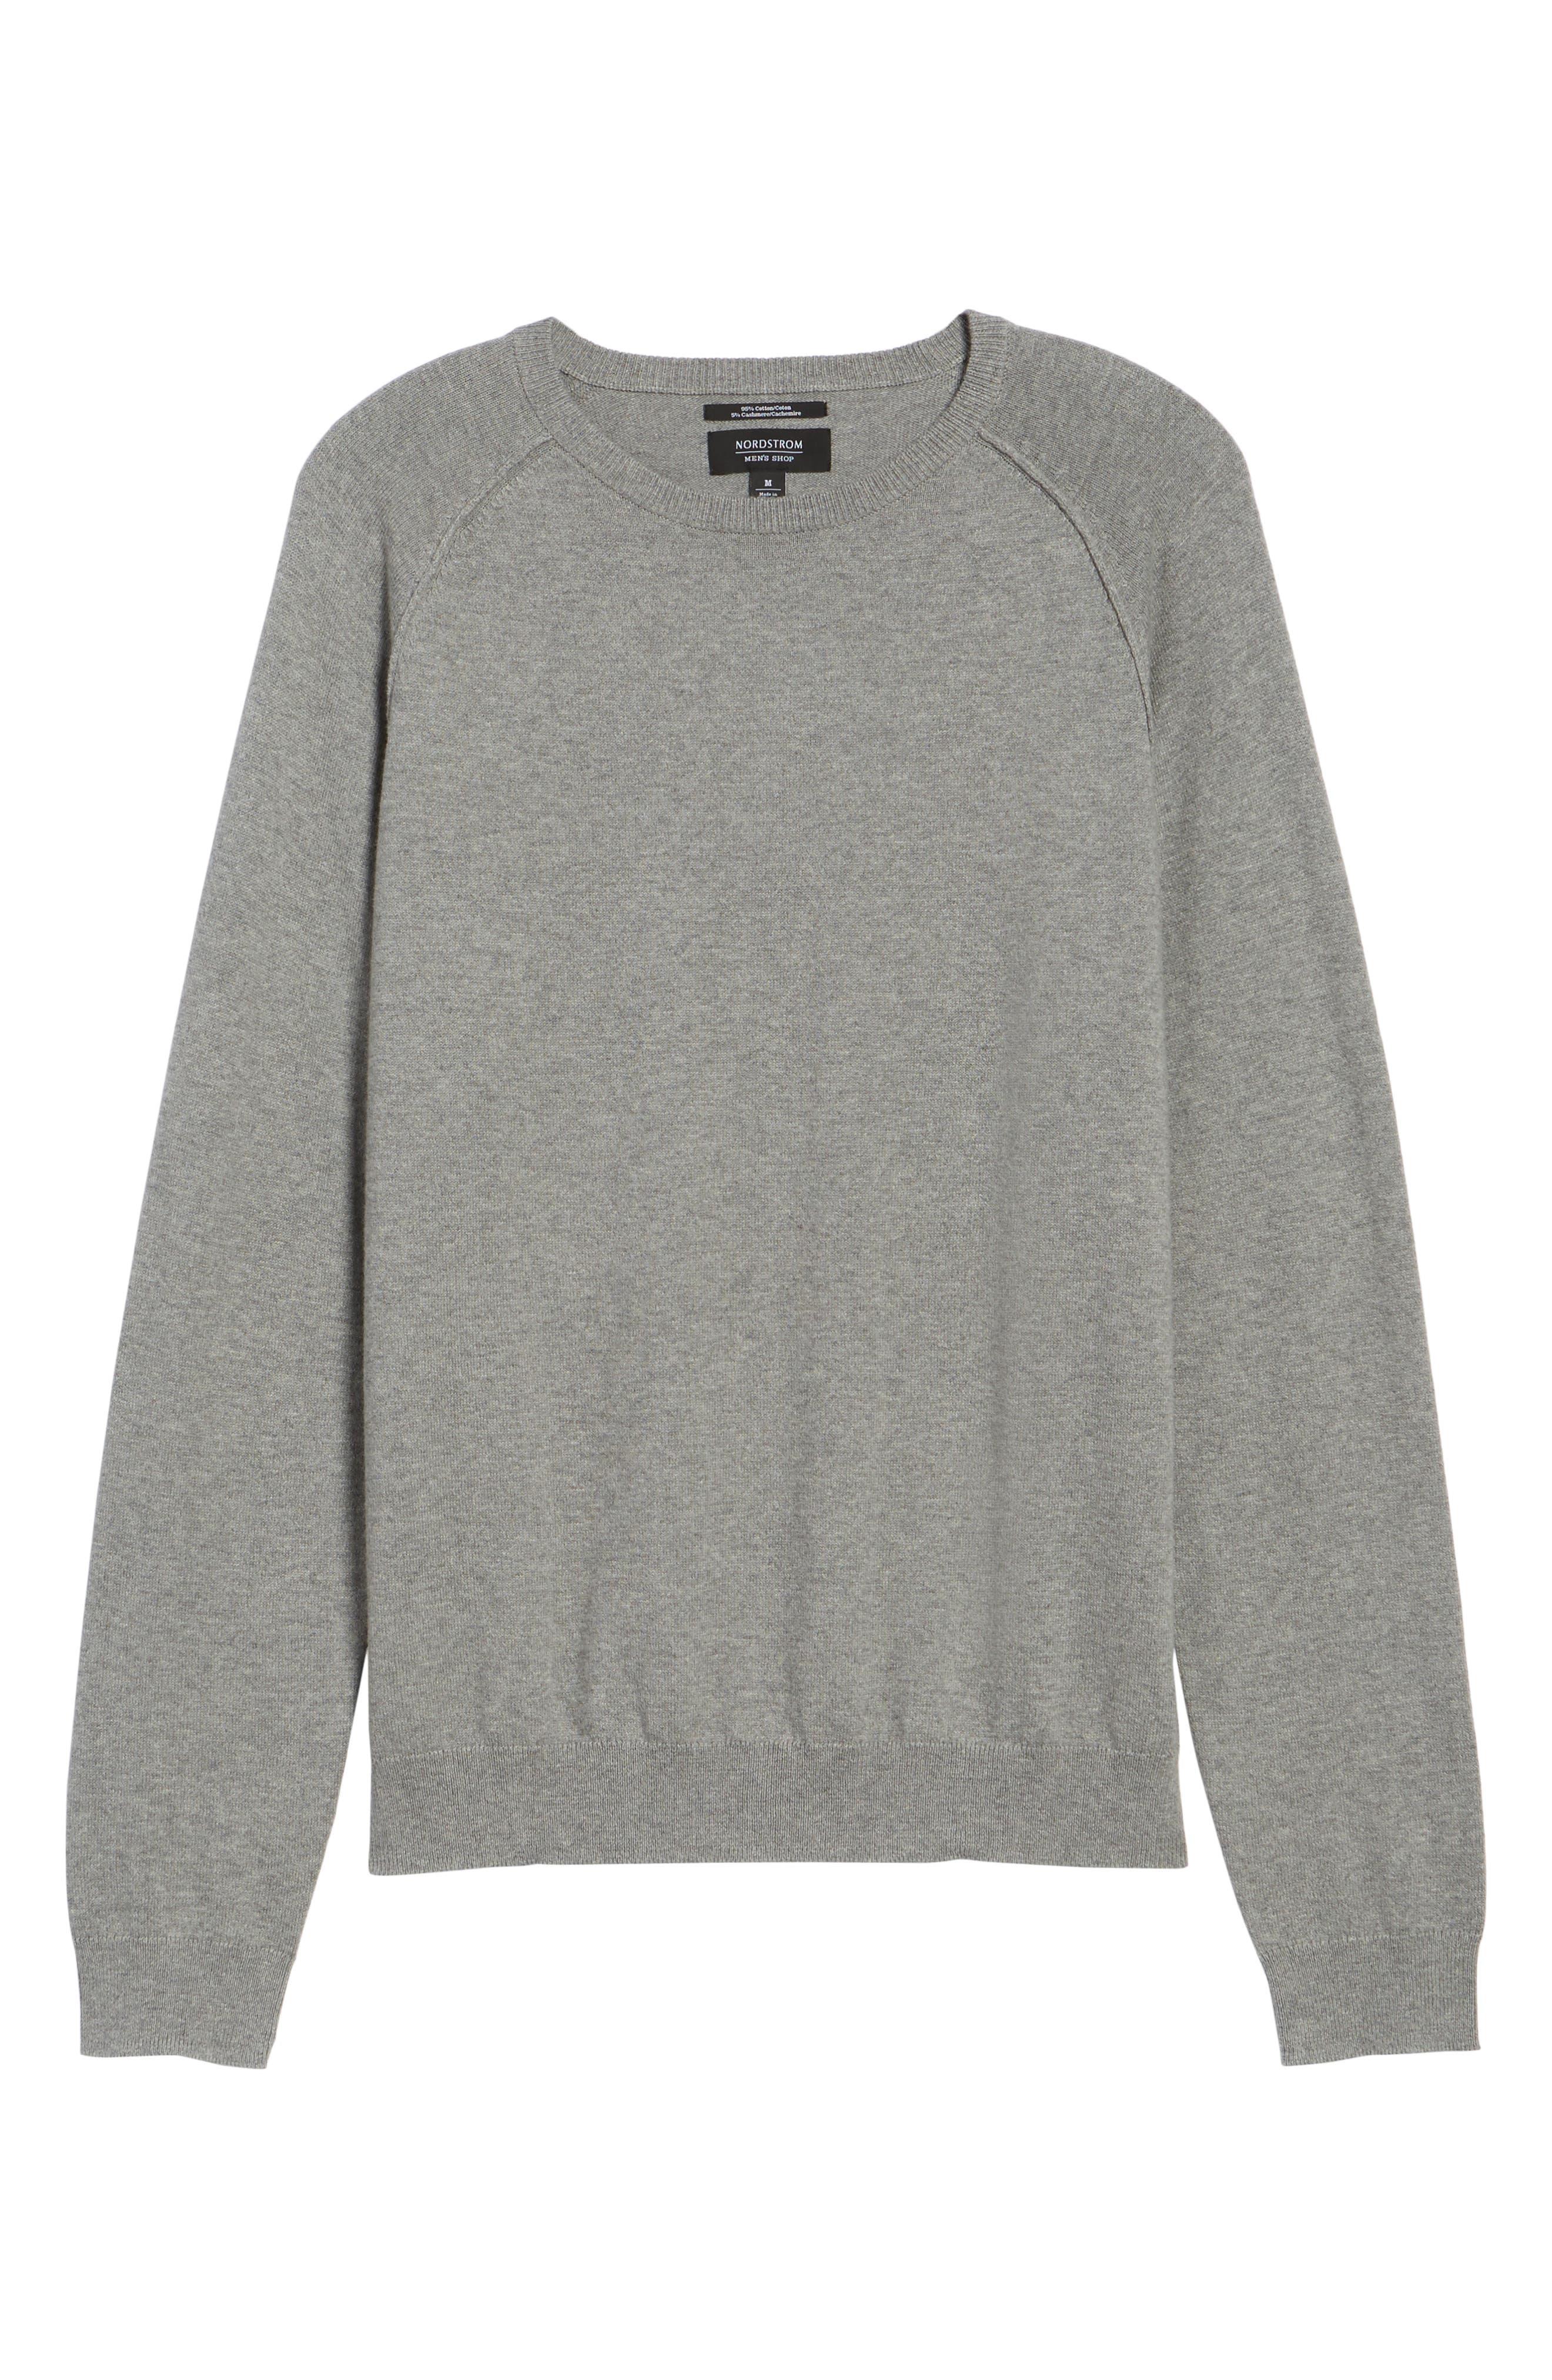 Saddle Shoulder Cotton & Cashmere Sweater,                             Alternate thumbnail 6, color,                             Grey Heather